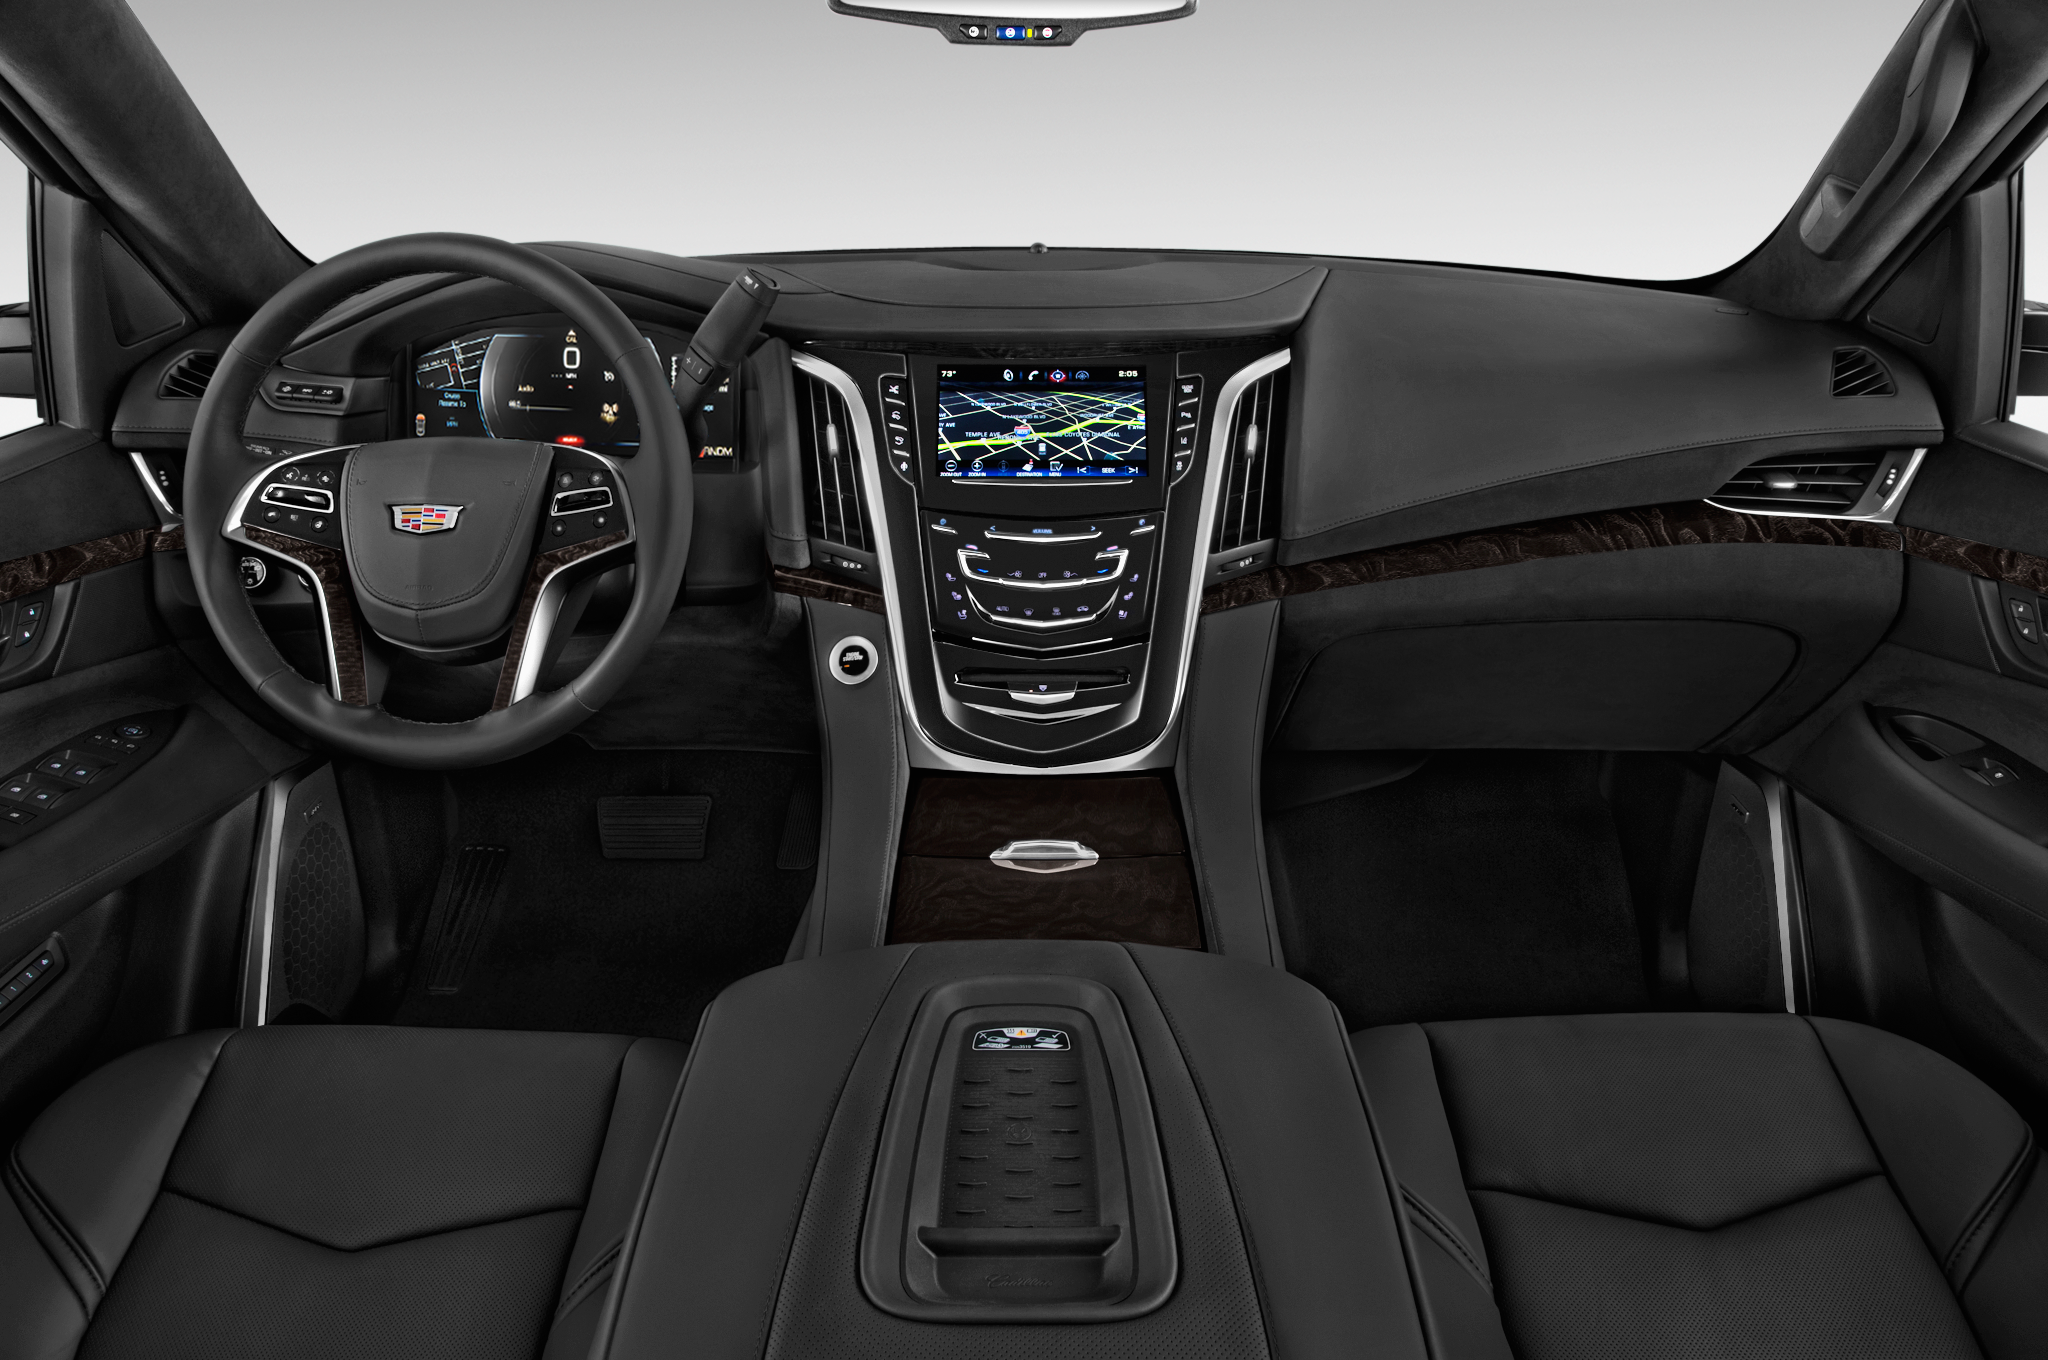 2020 Cadillac Escalade Spy Shots, Interior - 2020 - 2021 ...  2020 Cadillac Escalade